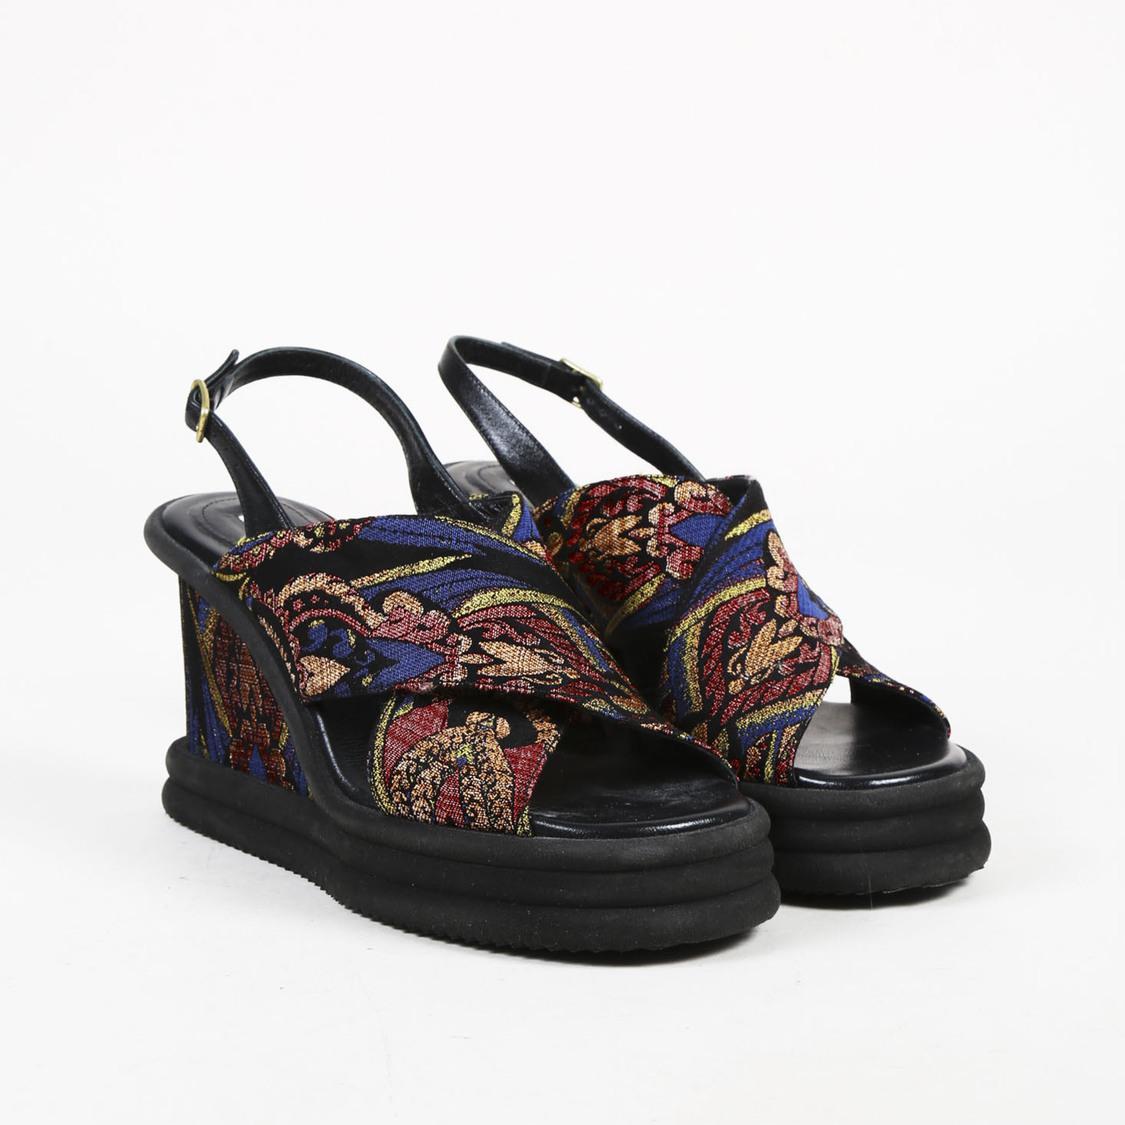 f52ab1d4198 Lyst - Dries Van Noten Jacquard Platform Sandals in Black